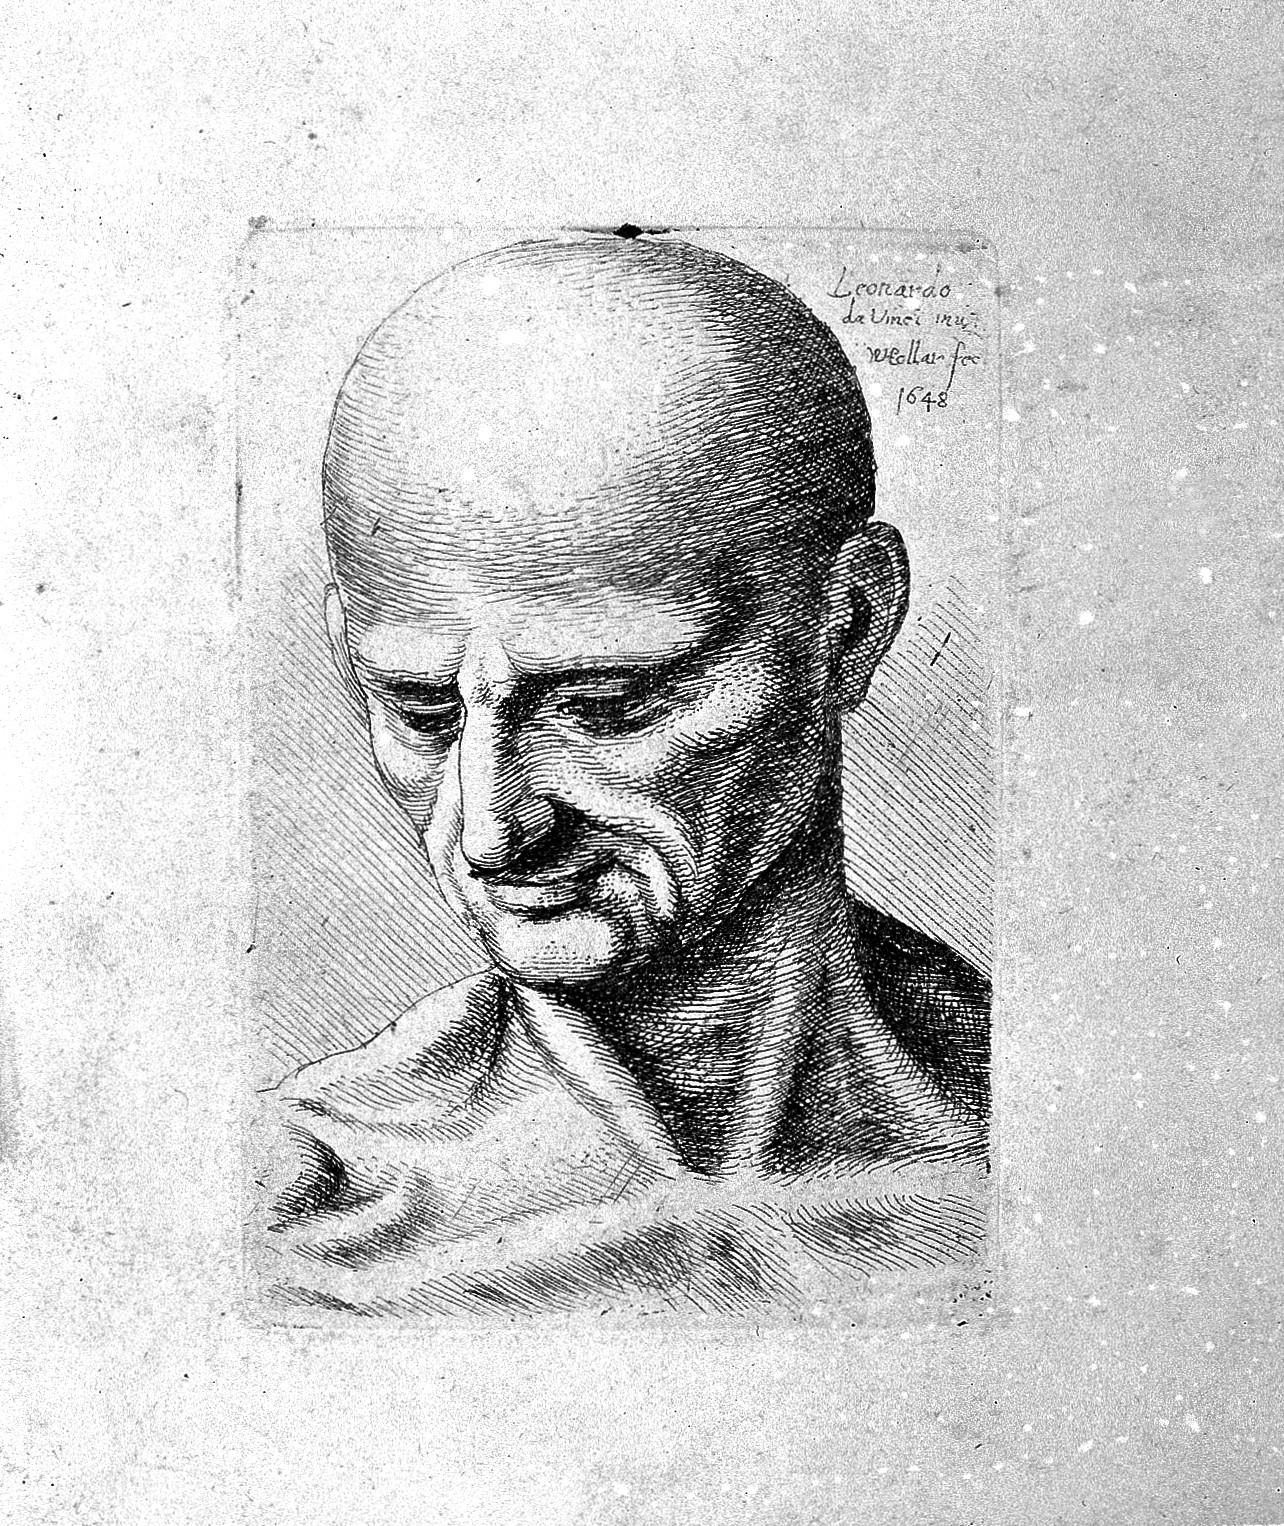 File:Leonardo da Vinci; engravings of some anatomical drawings ...